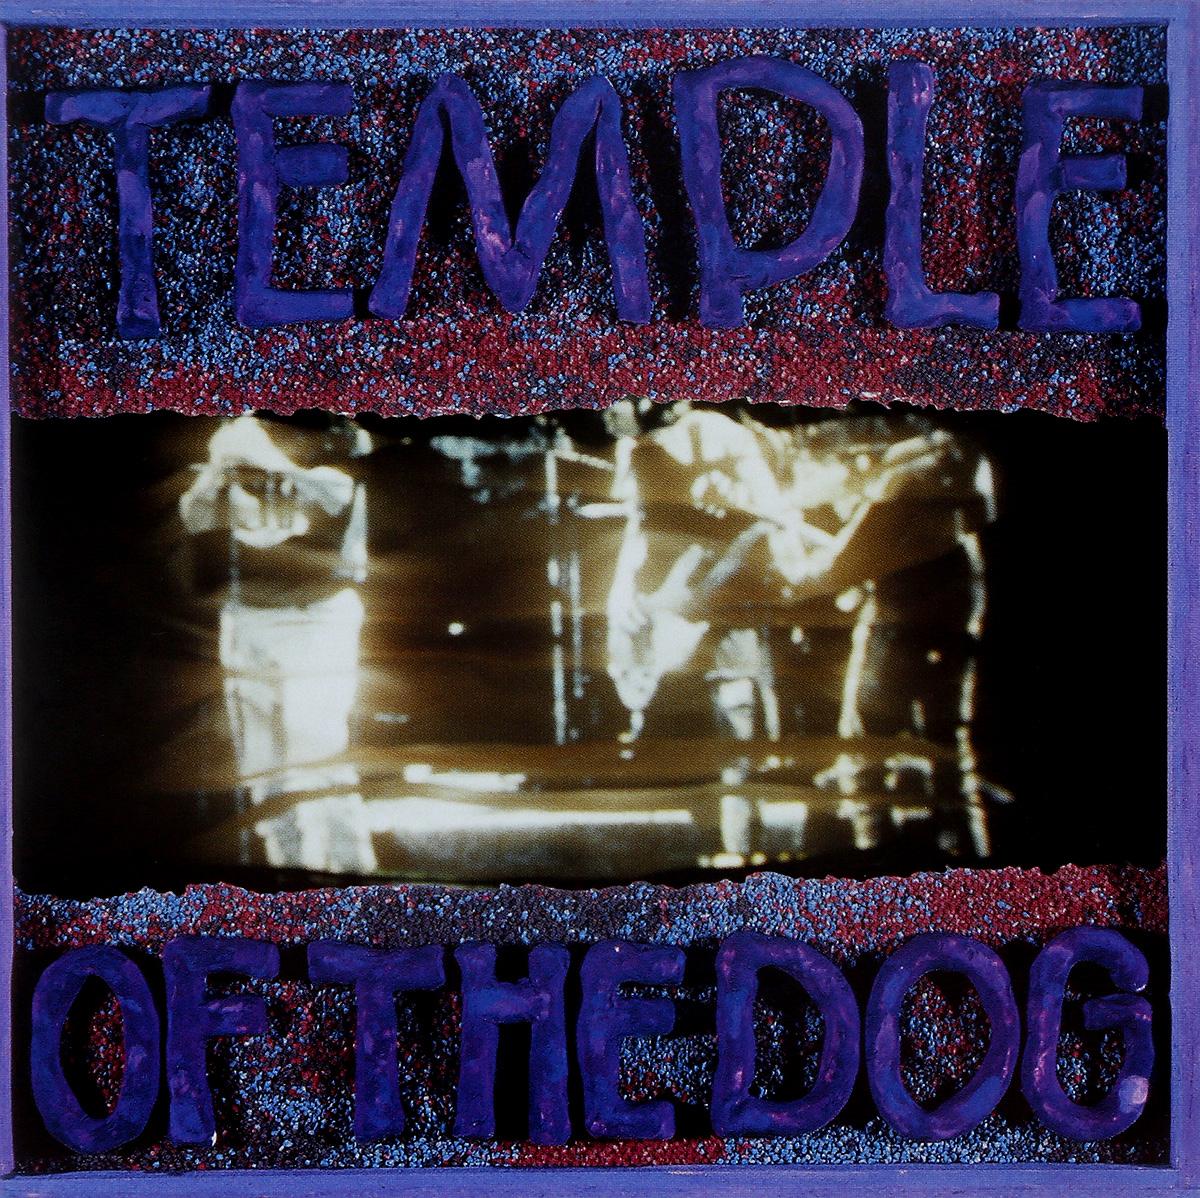 Temple Of The Dog Temple Of The Dog. Temple Of The Dog black temple black temple it all ends